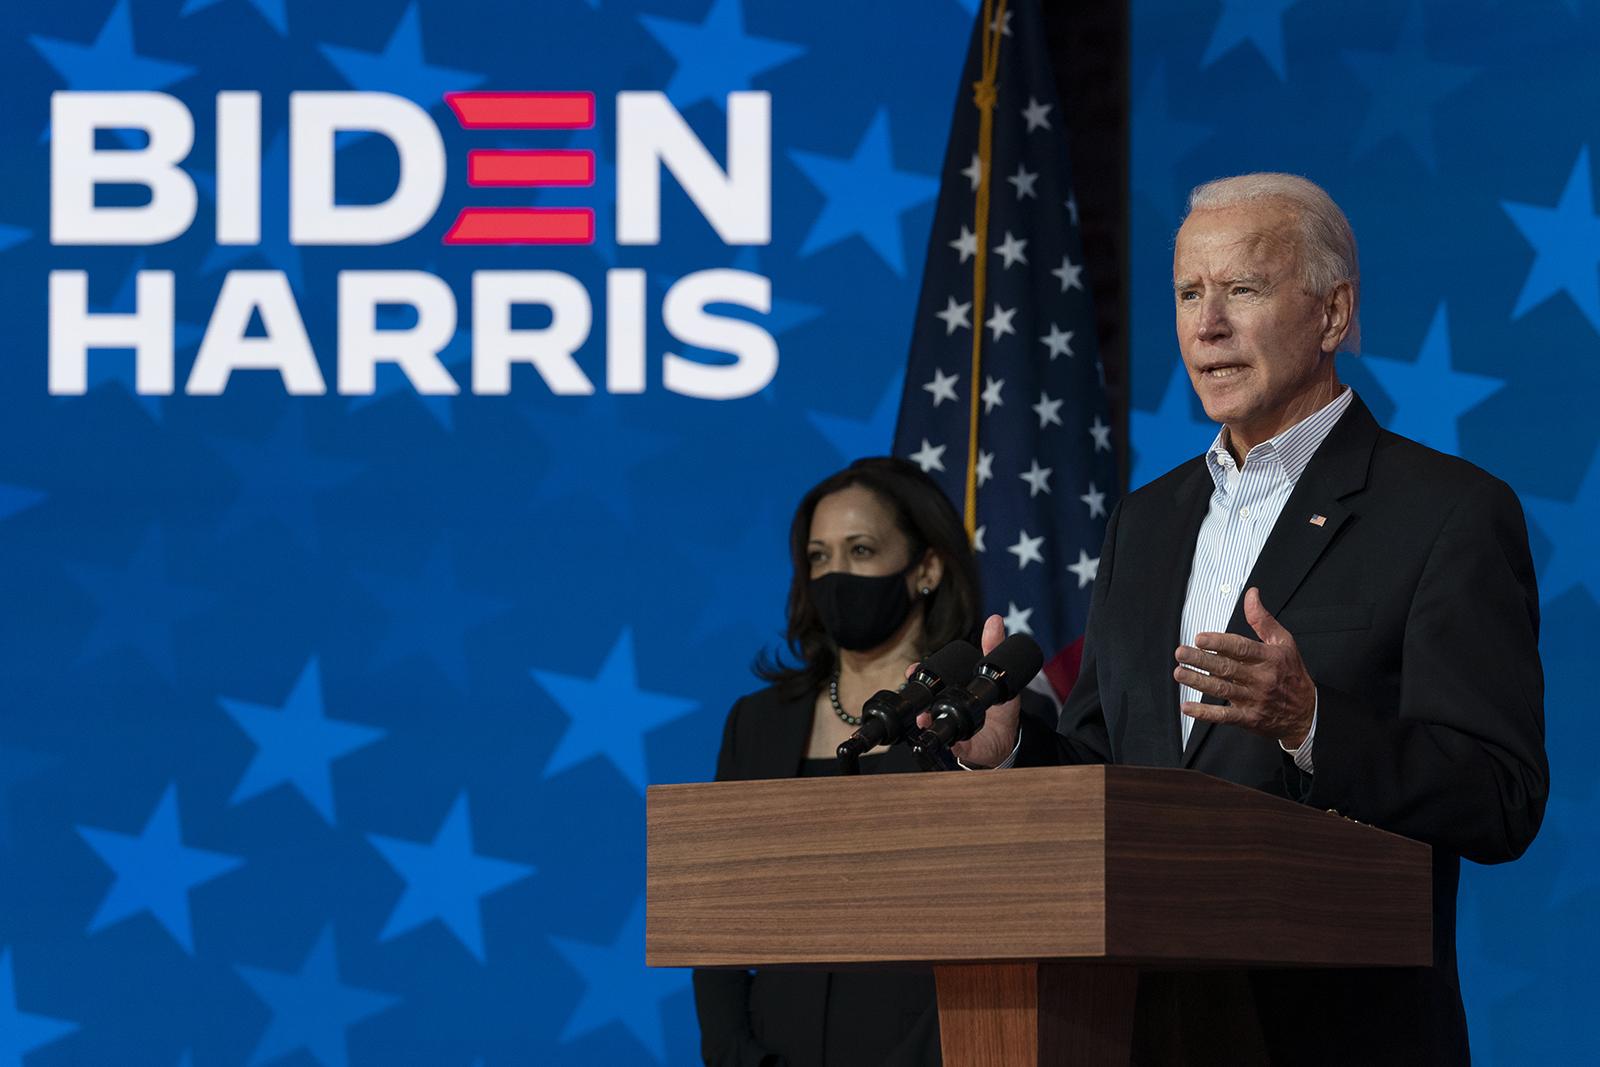 Democratic presidential candidate Joe Biden joined by Democratic vice presidential candidate Sen. Kamala Harris, D-Calif., speaks at the The Queen theater Thursday, Nov. 5, in Wilmington, Delaware.